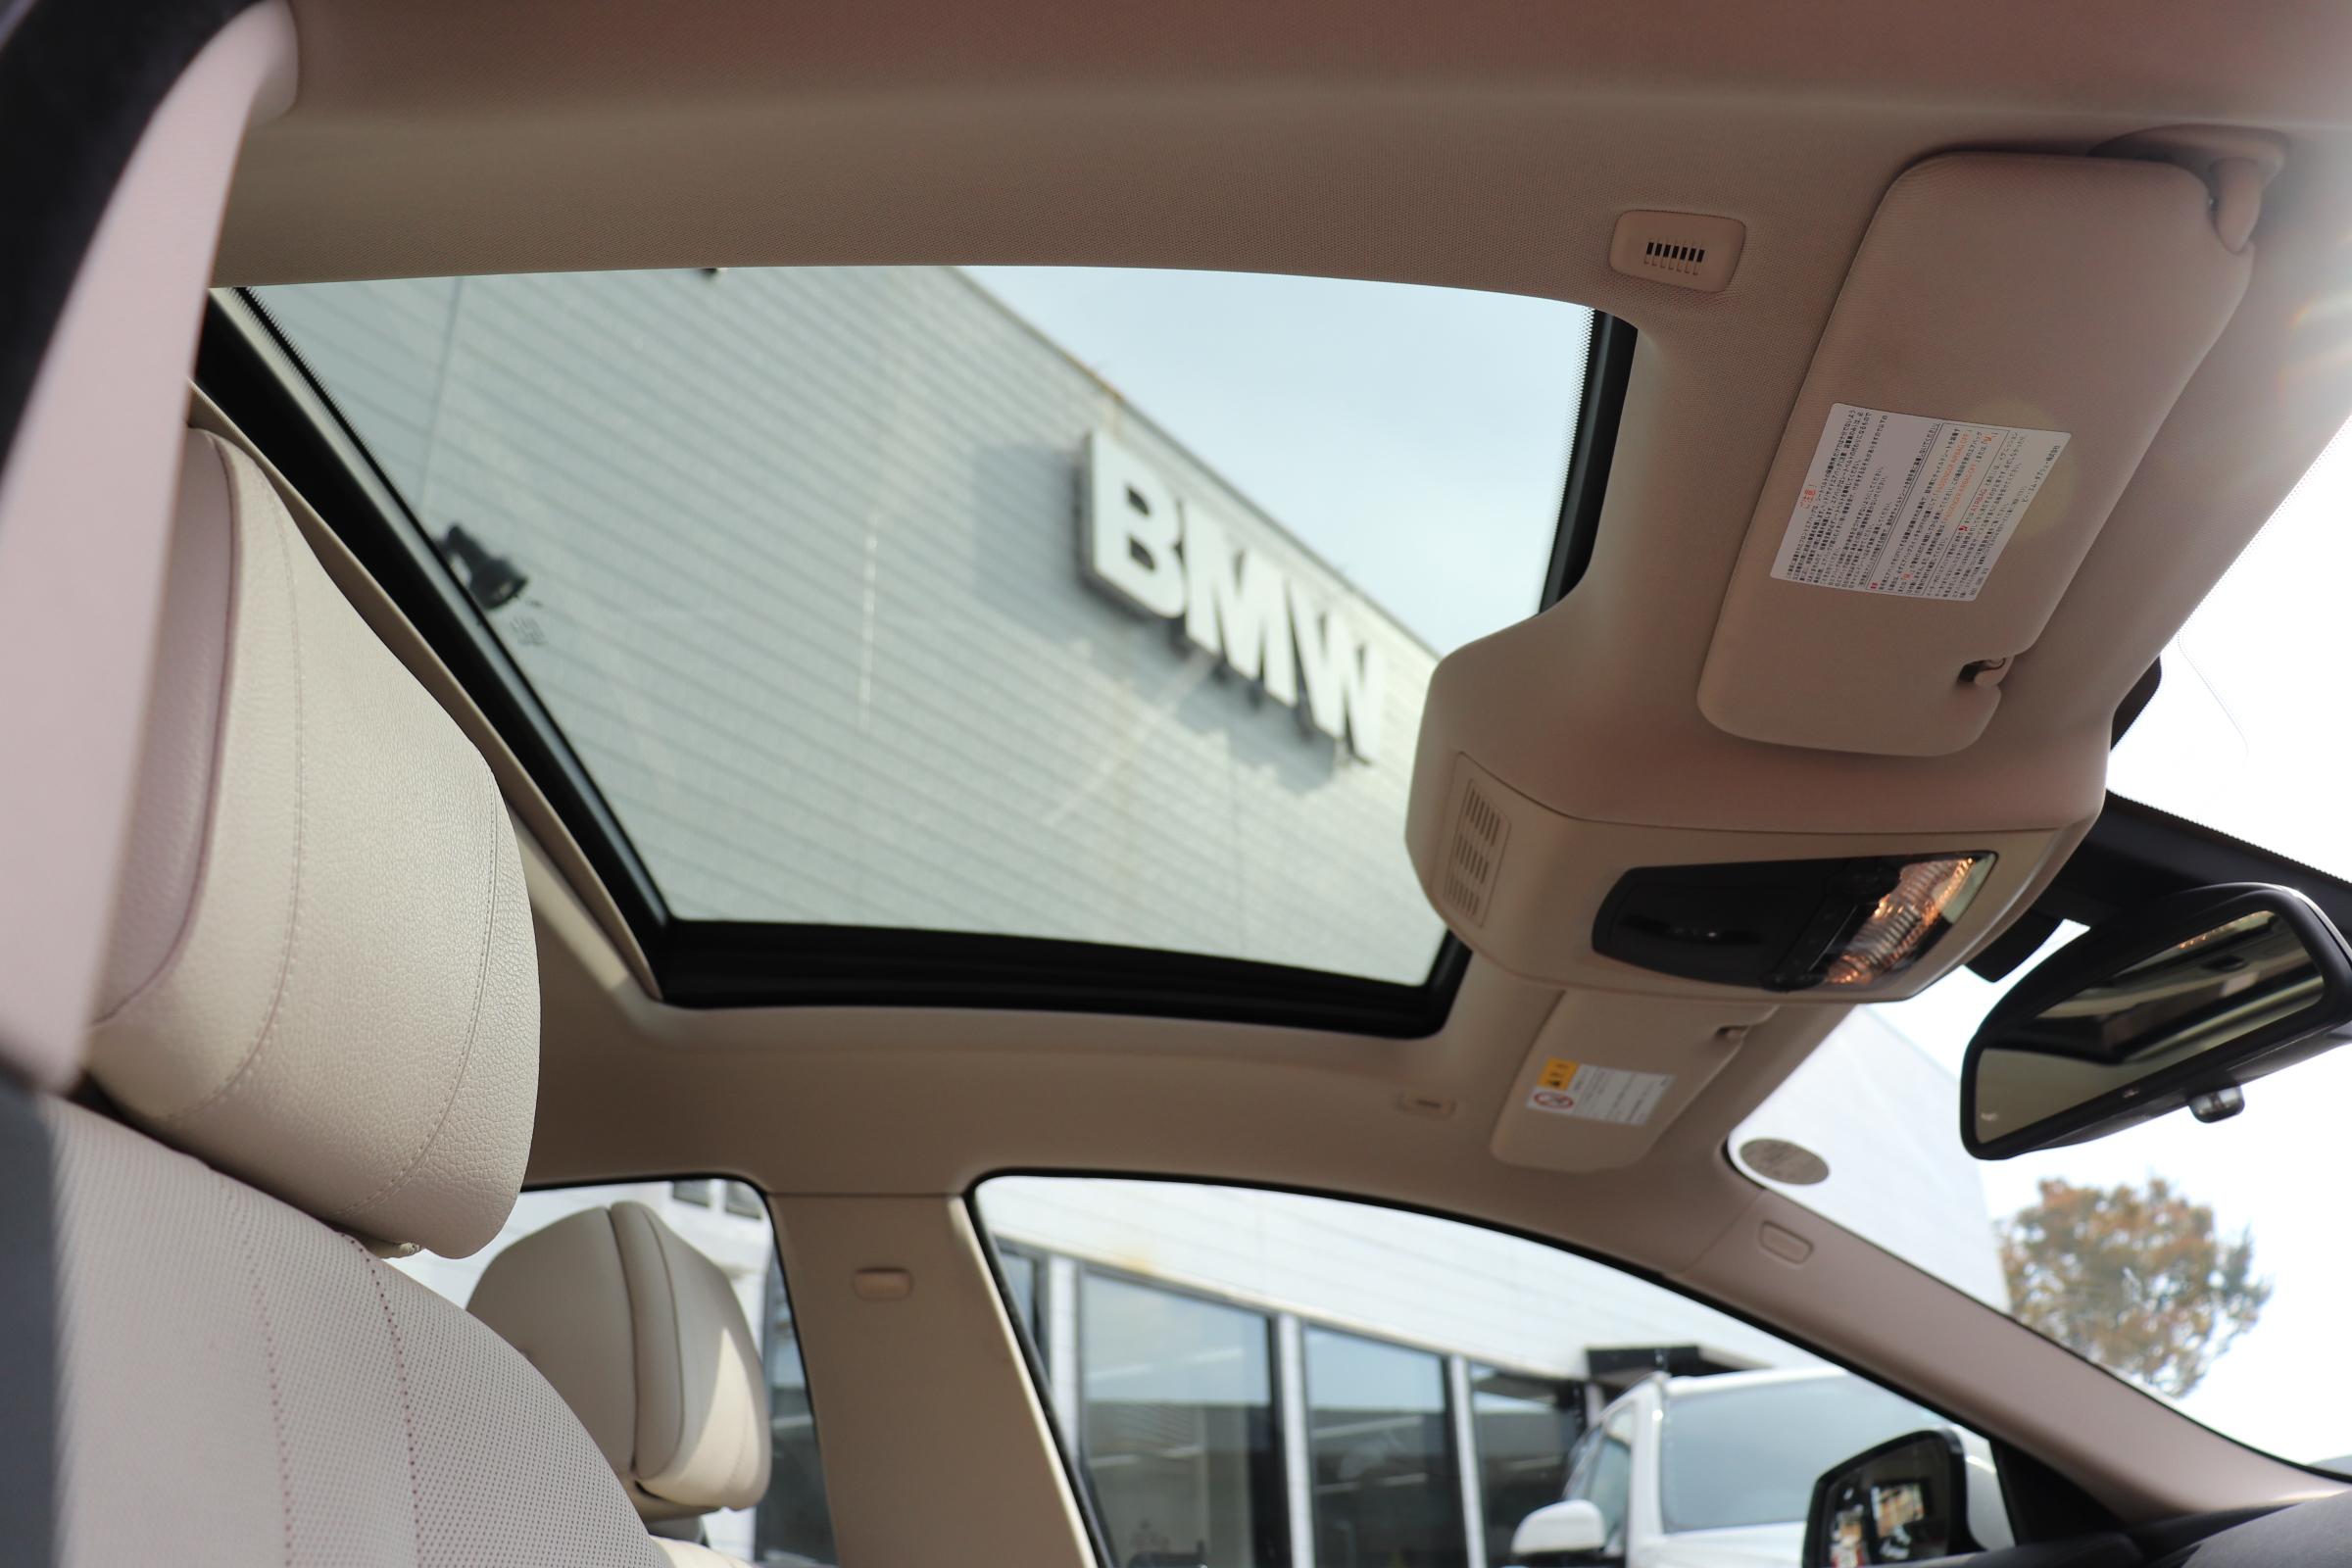 640iグランクーペ BEAMコンプリートカー コンフォートパッケージ LEDヘッドライト SR 白革 ワンオーナー車両画像11